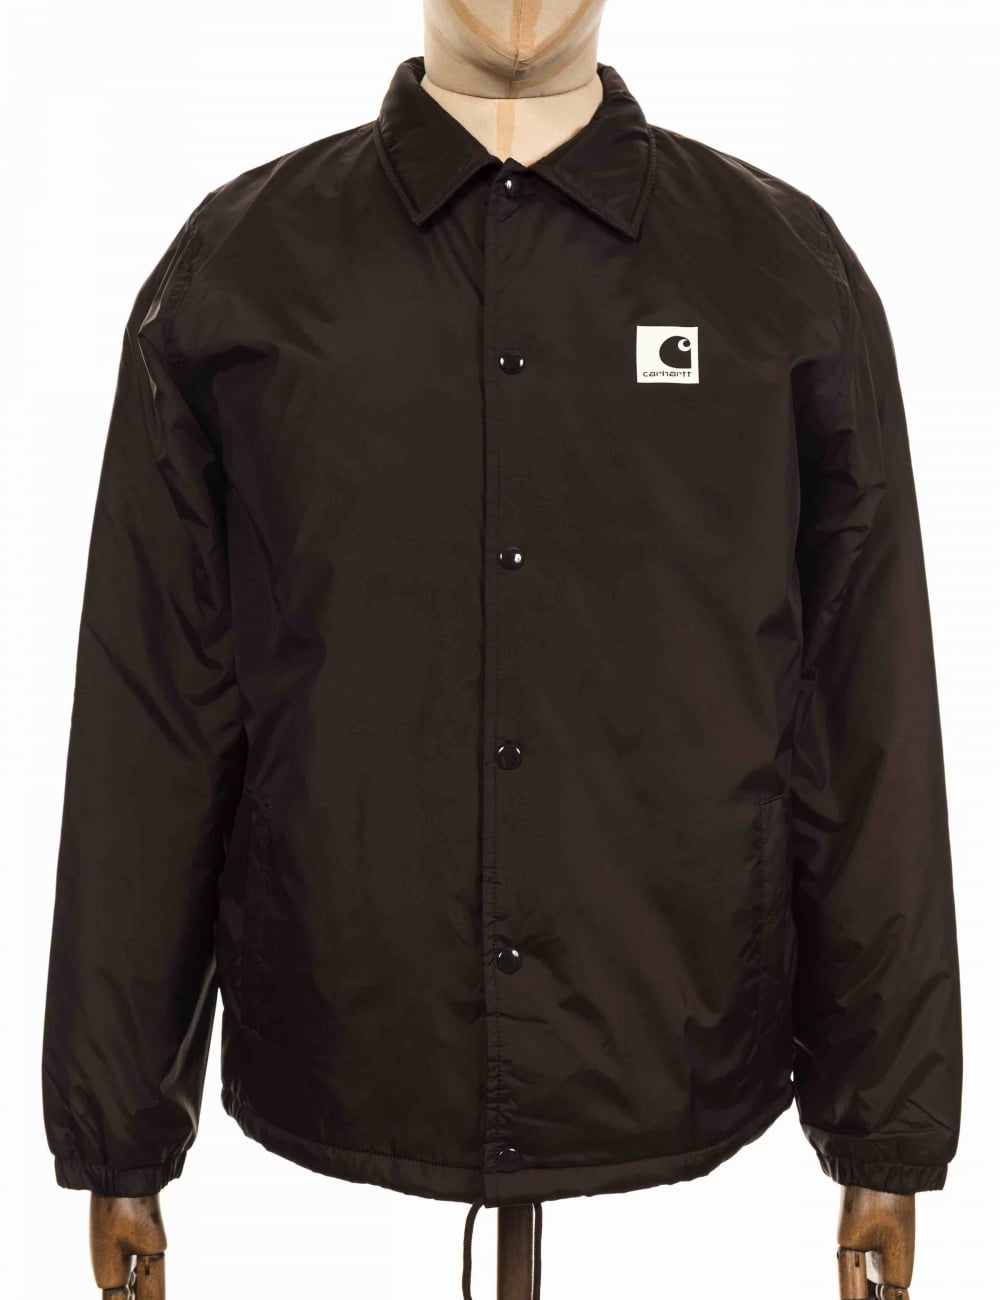 sale best online low price Sports Pile Jacket - Tobacco